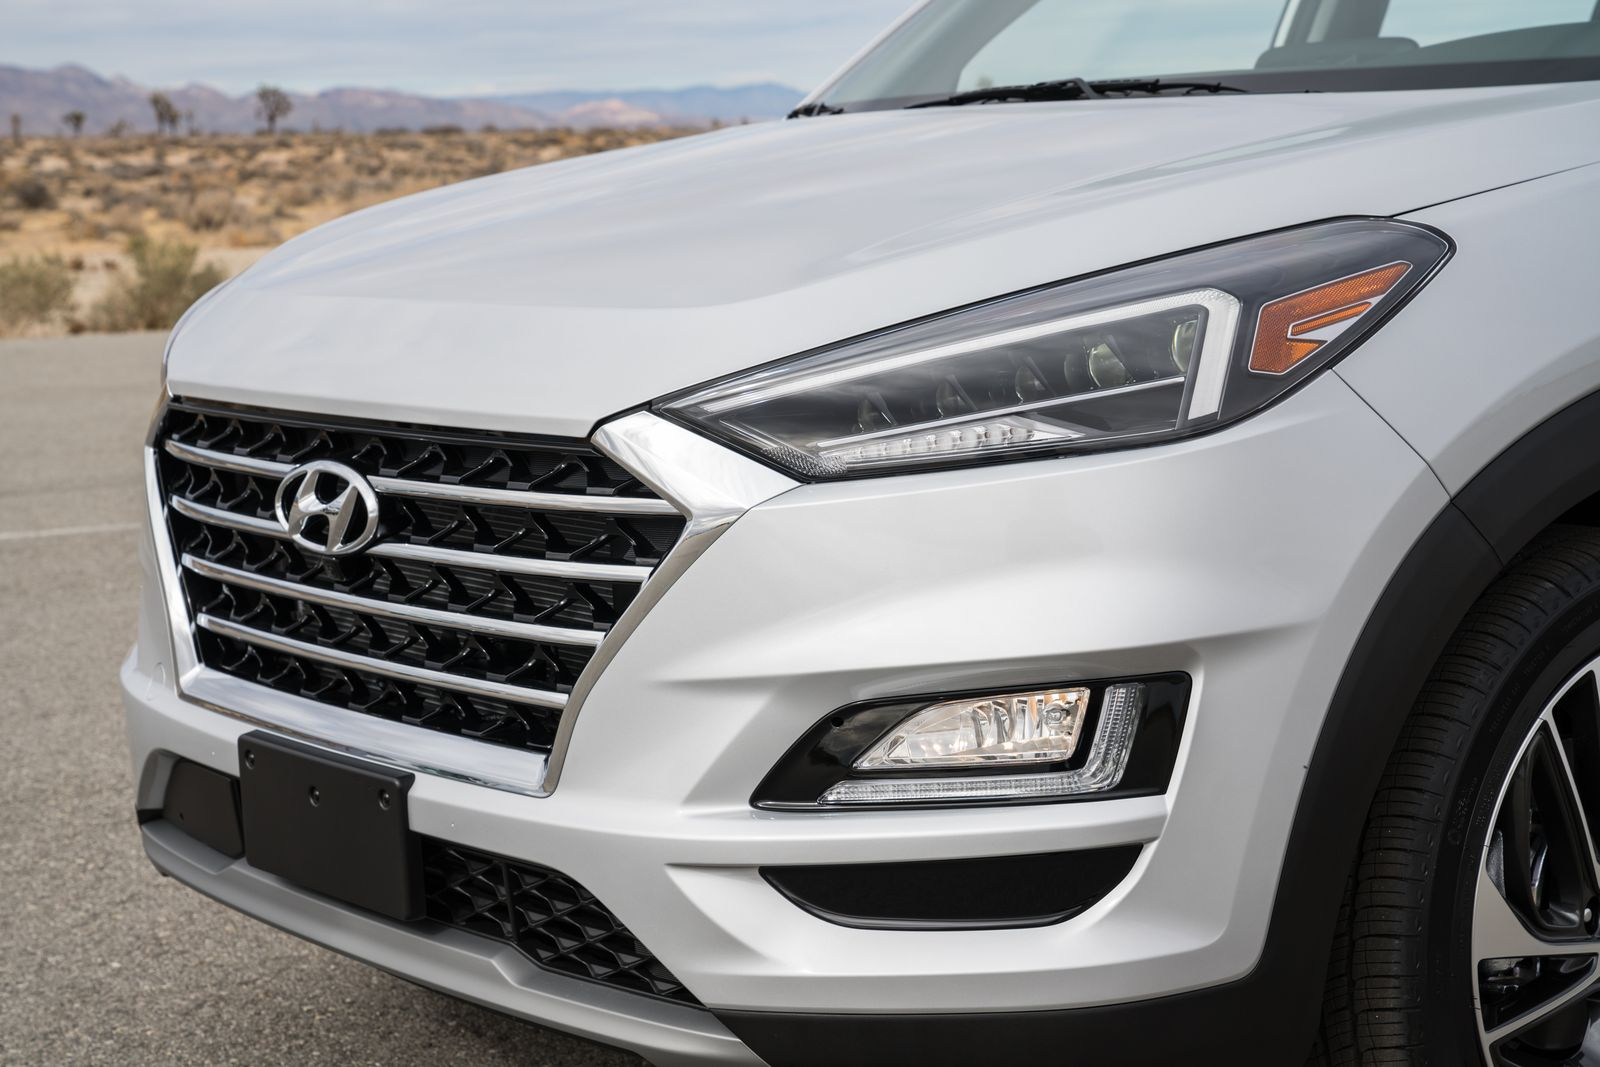 Moderni farovi na Hyundai Tucson modelu iz 2019.